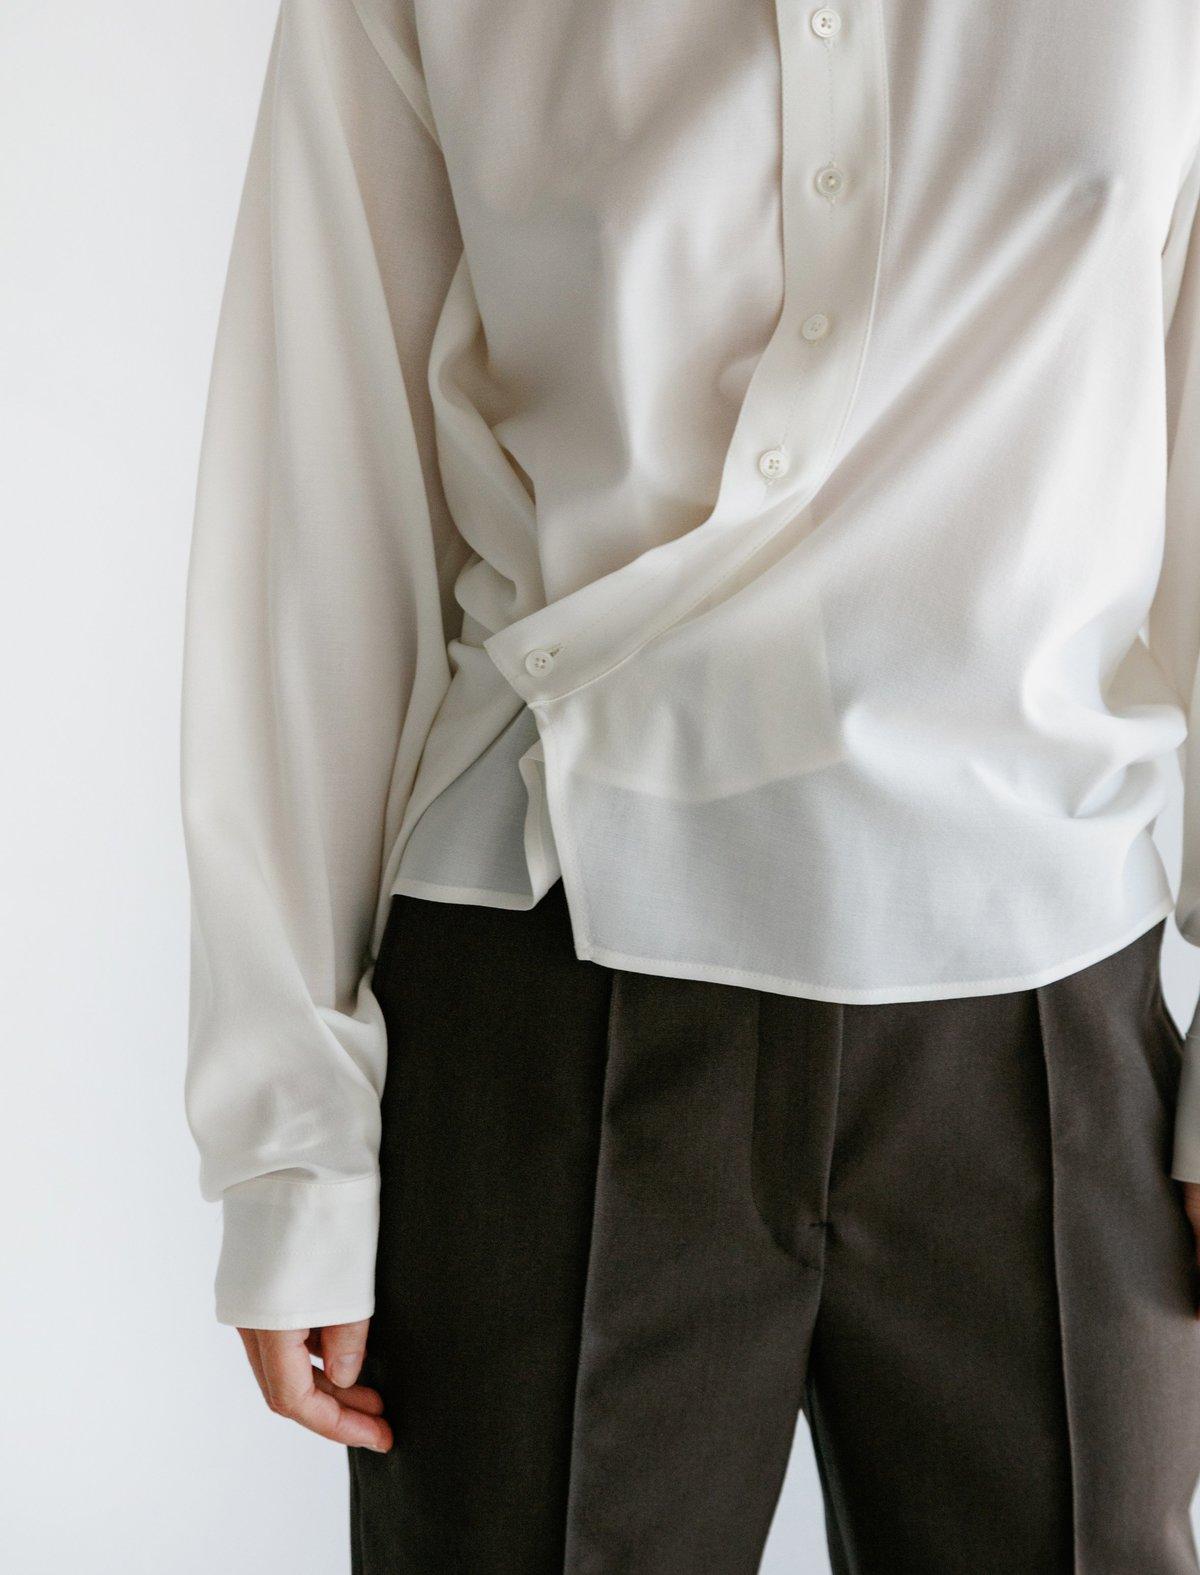 Lemaire High Collar Twisted Shirt Garmentory